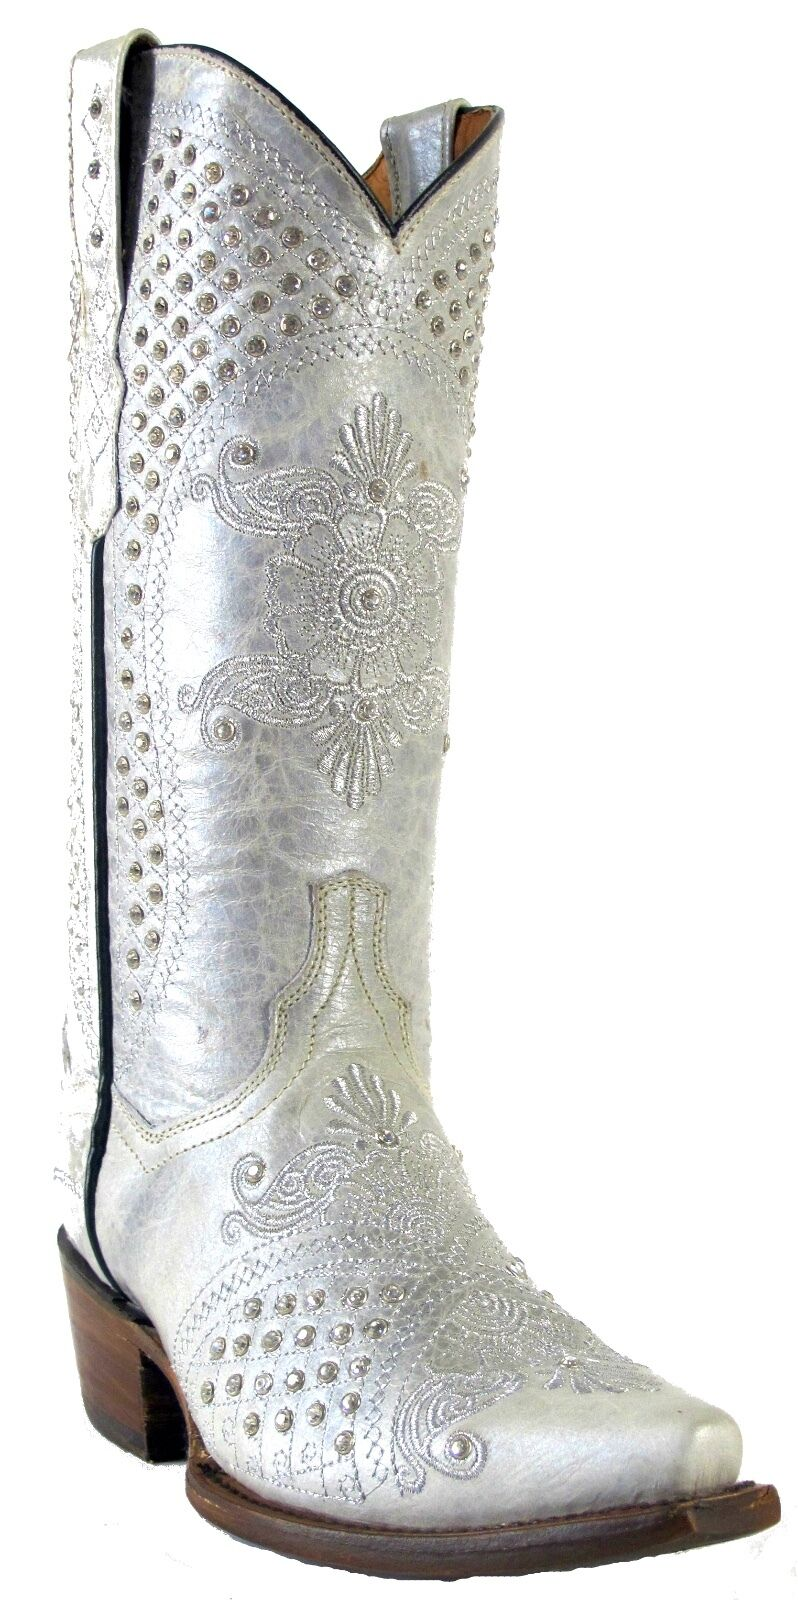 Donna  Distressed Pelle Studs Rhinestone Cowgirl Western Stivali Snip Of White